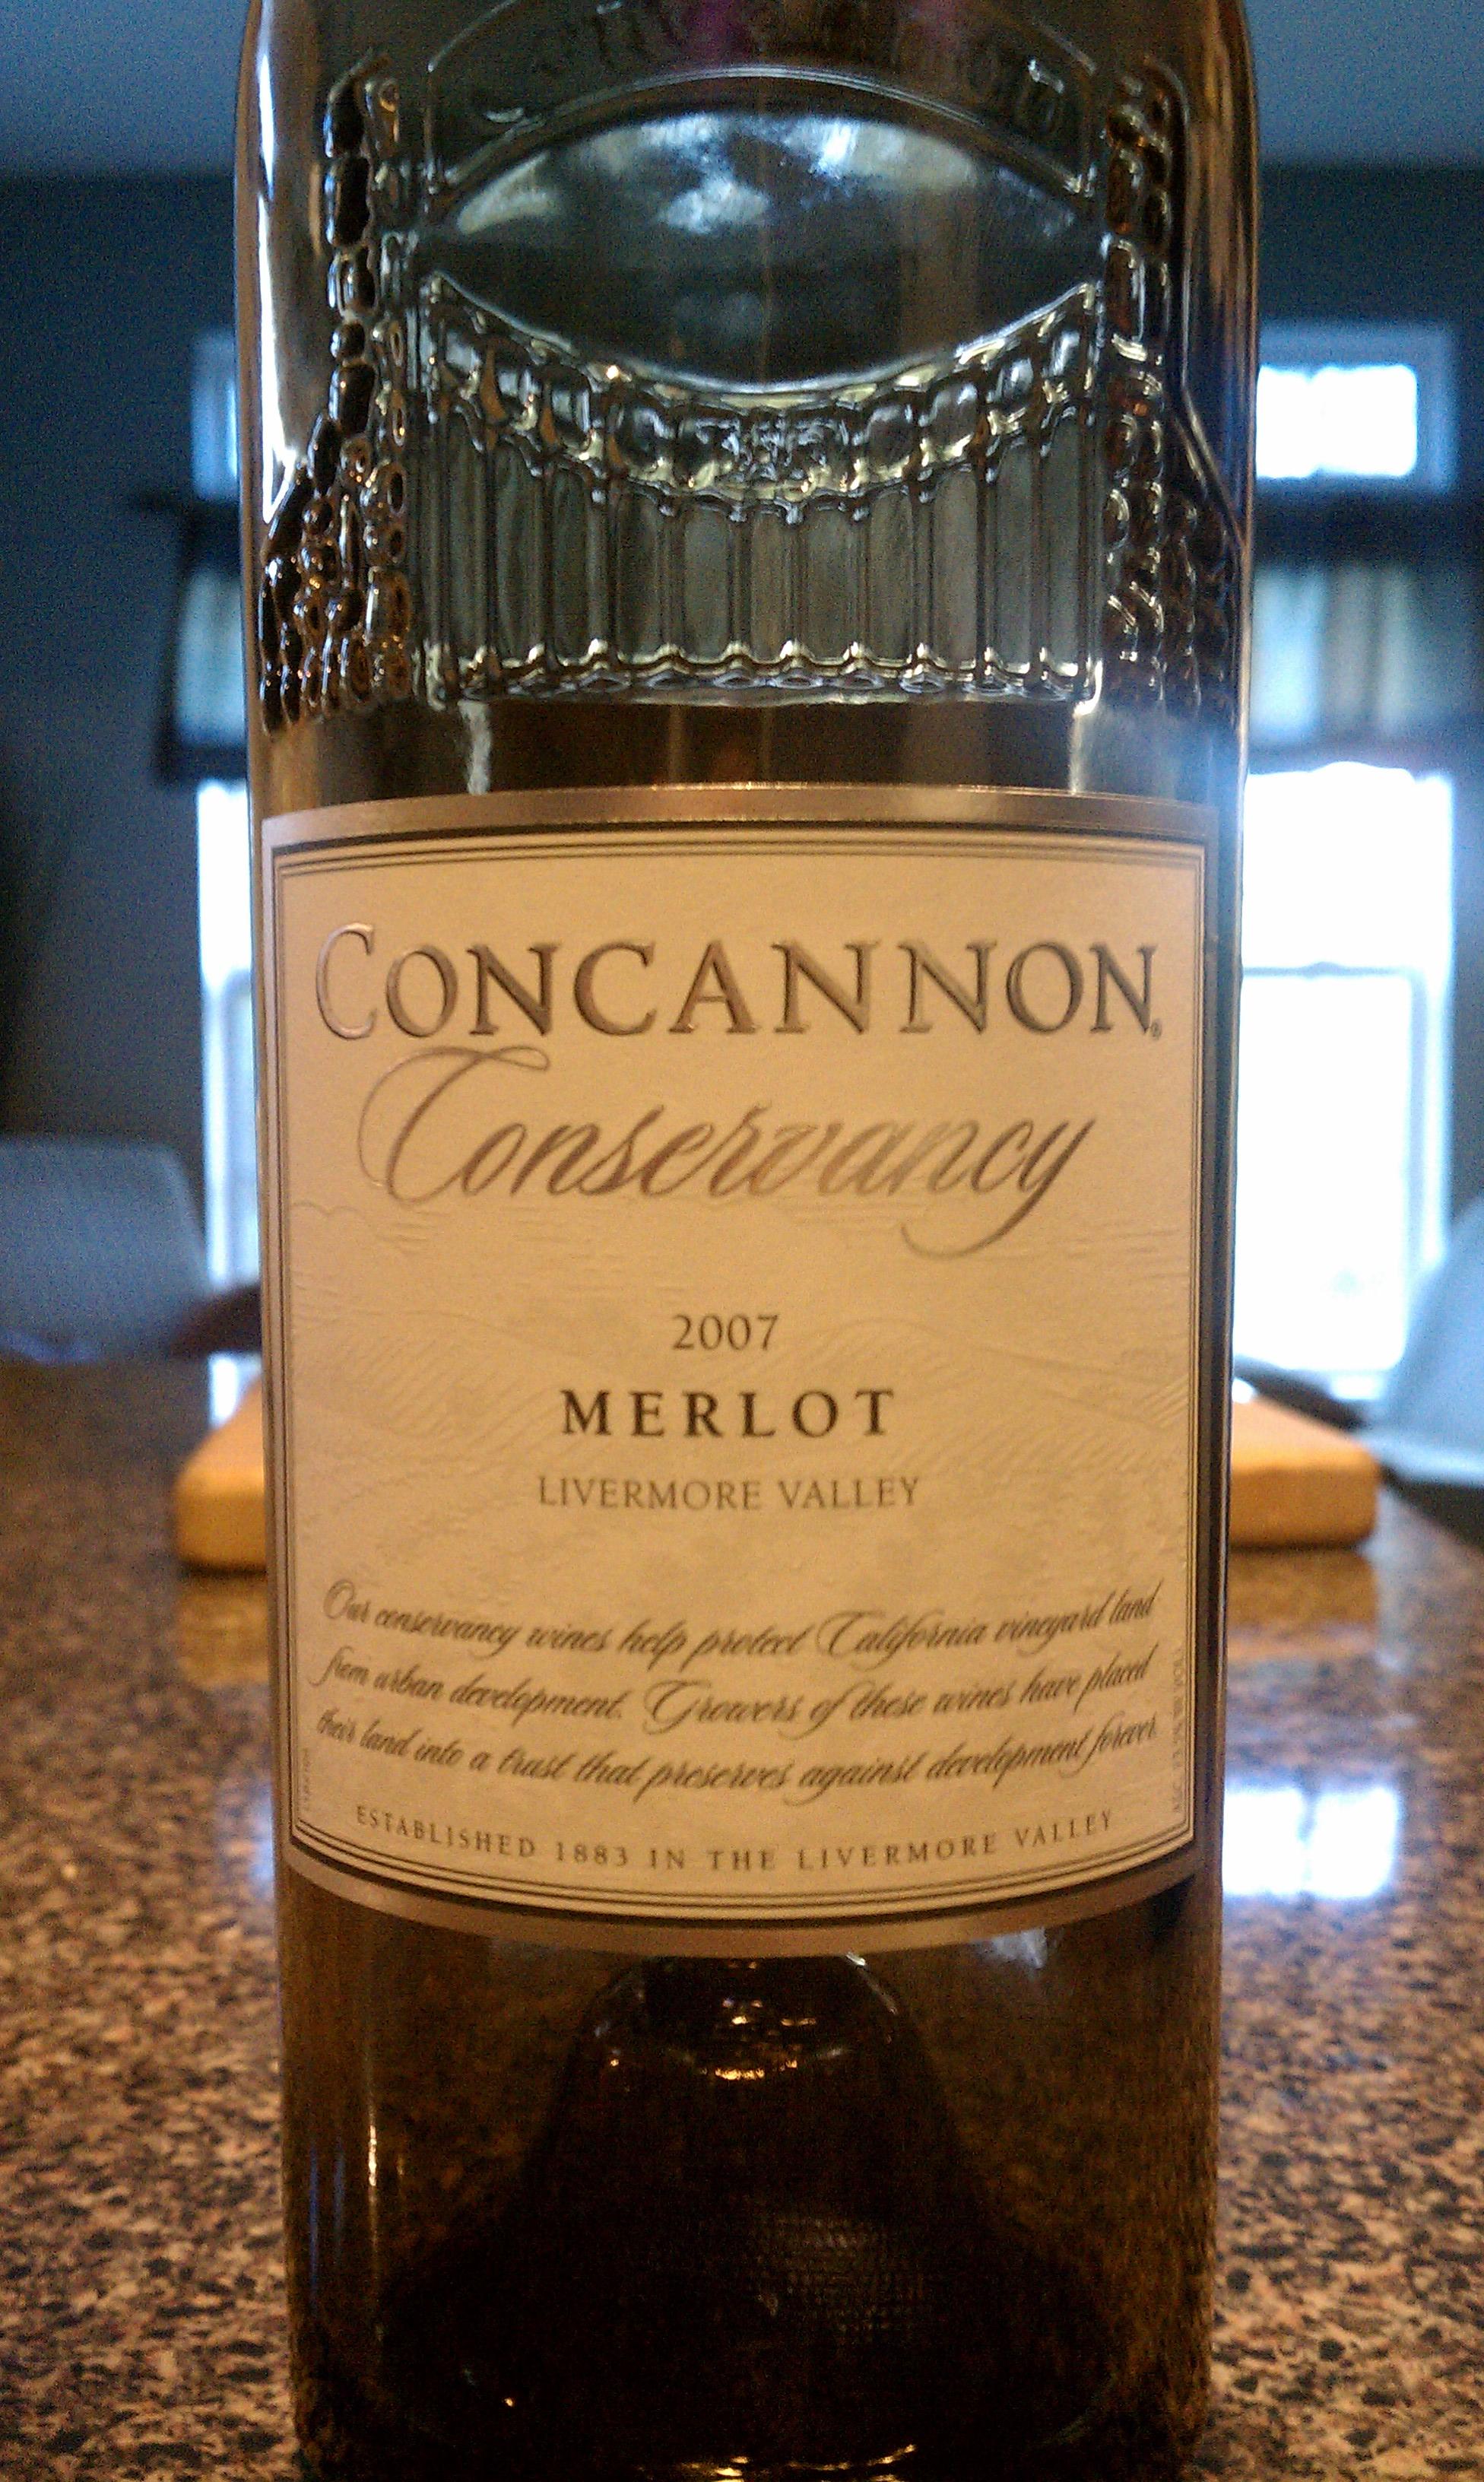 2007 Concannon Conservancy Merlot